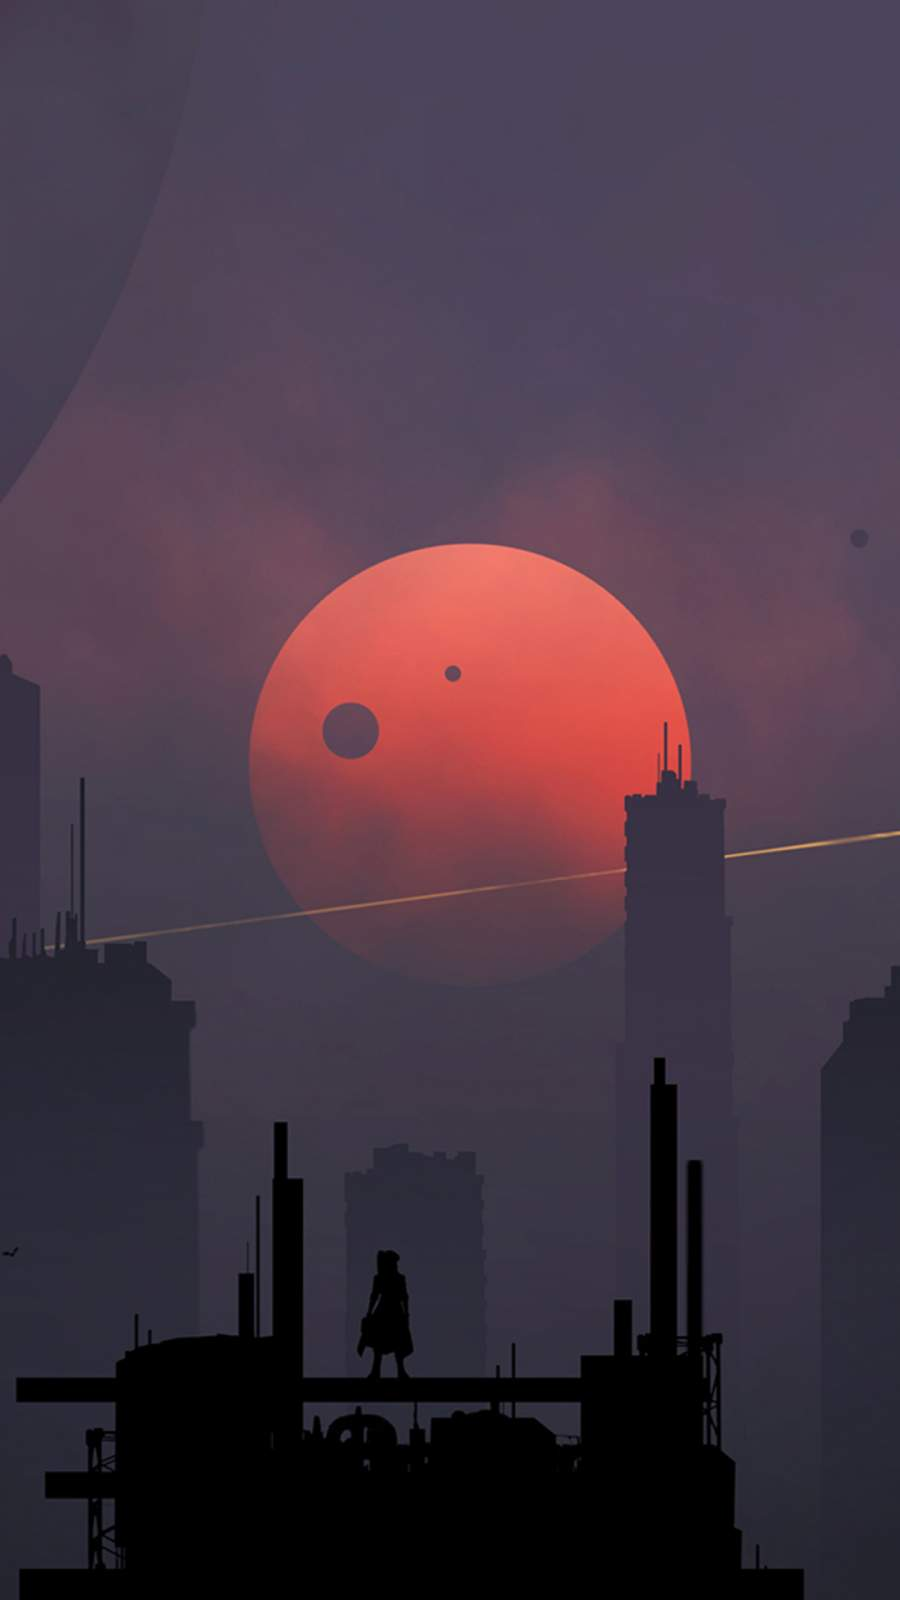 Scifi City Minimalism iPhone Wallpaper